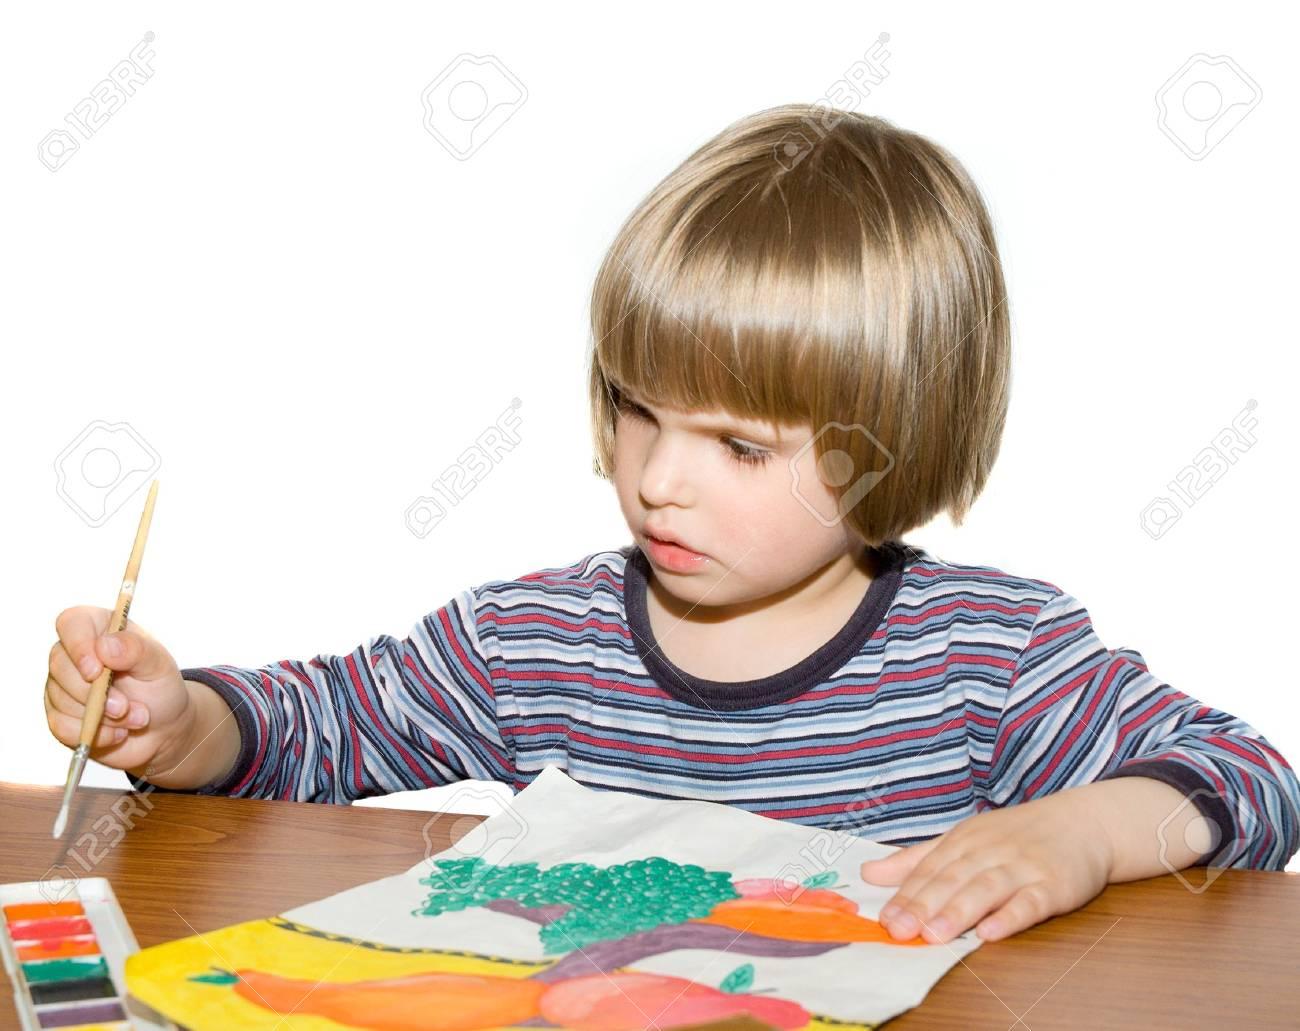 child draws paints Stock Photo - 3058103